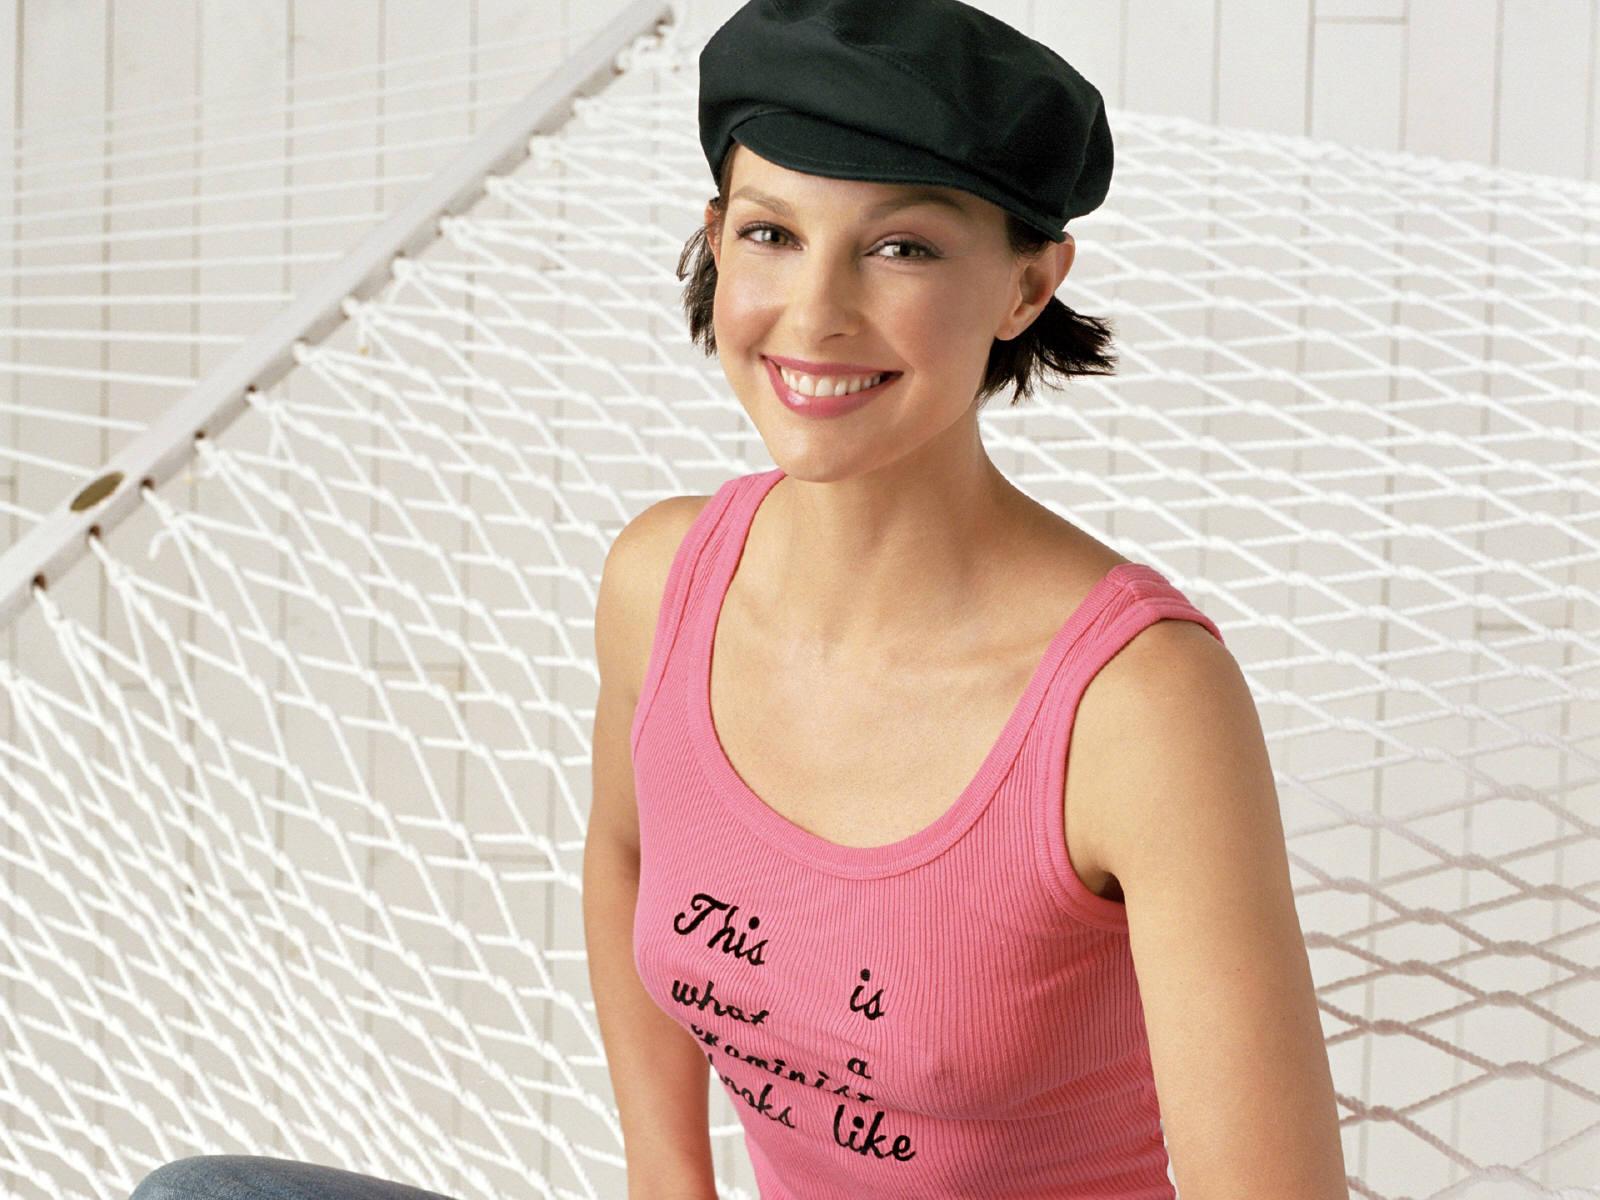 Ashley judd actress photos